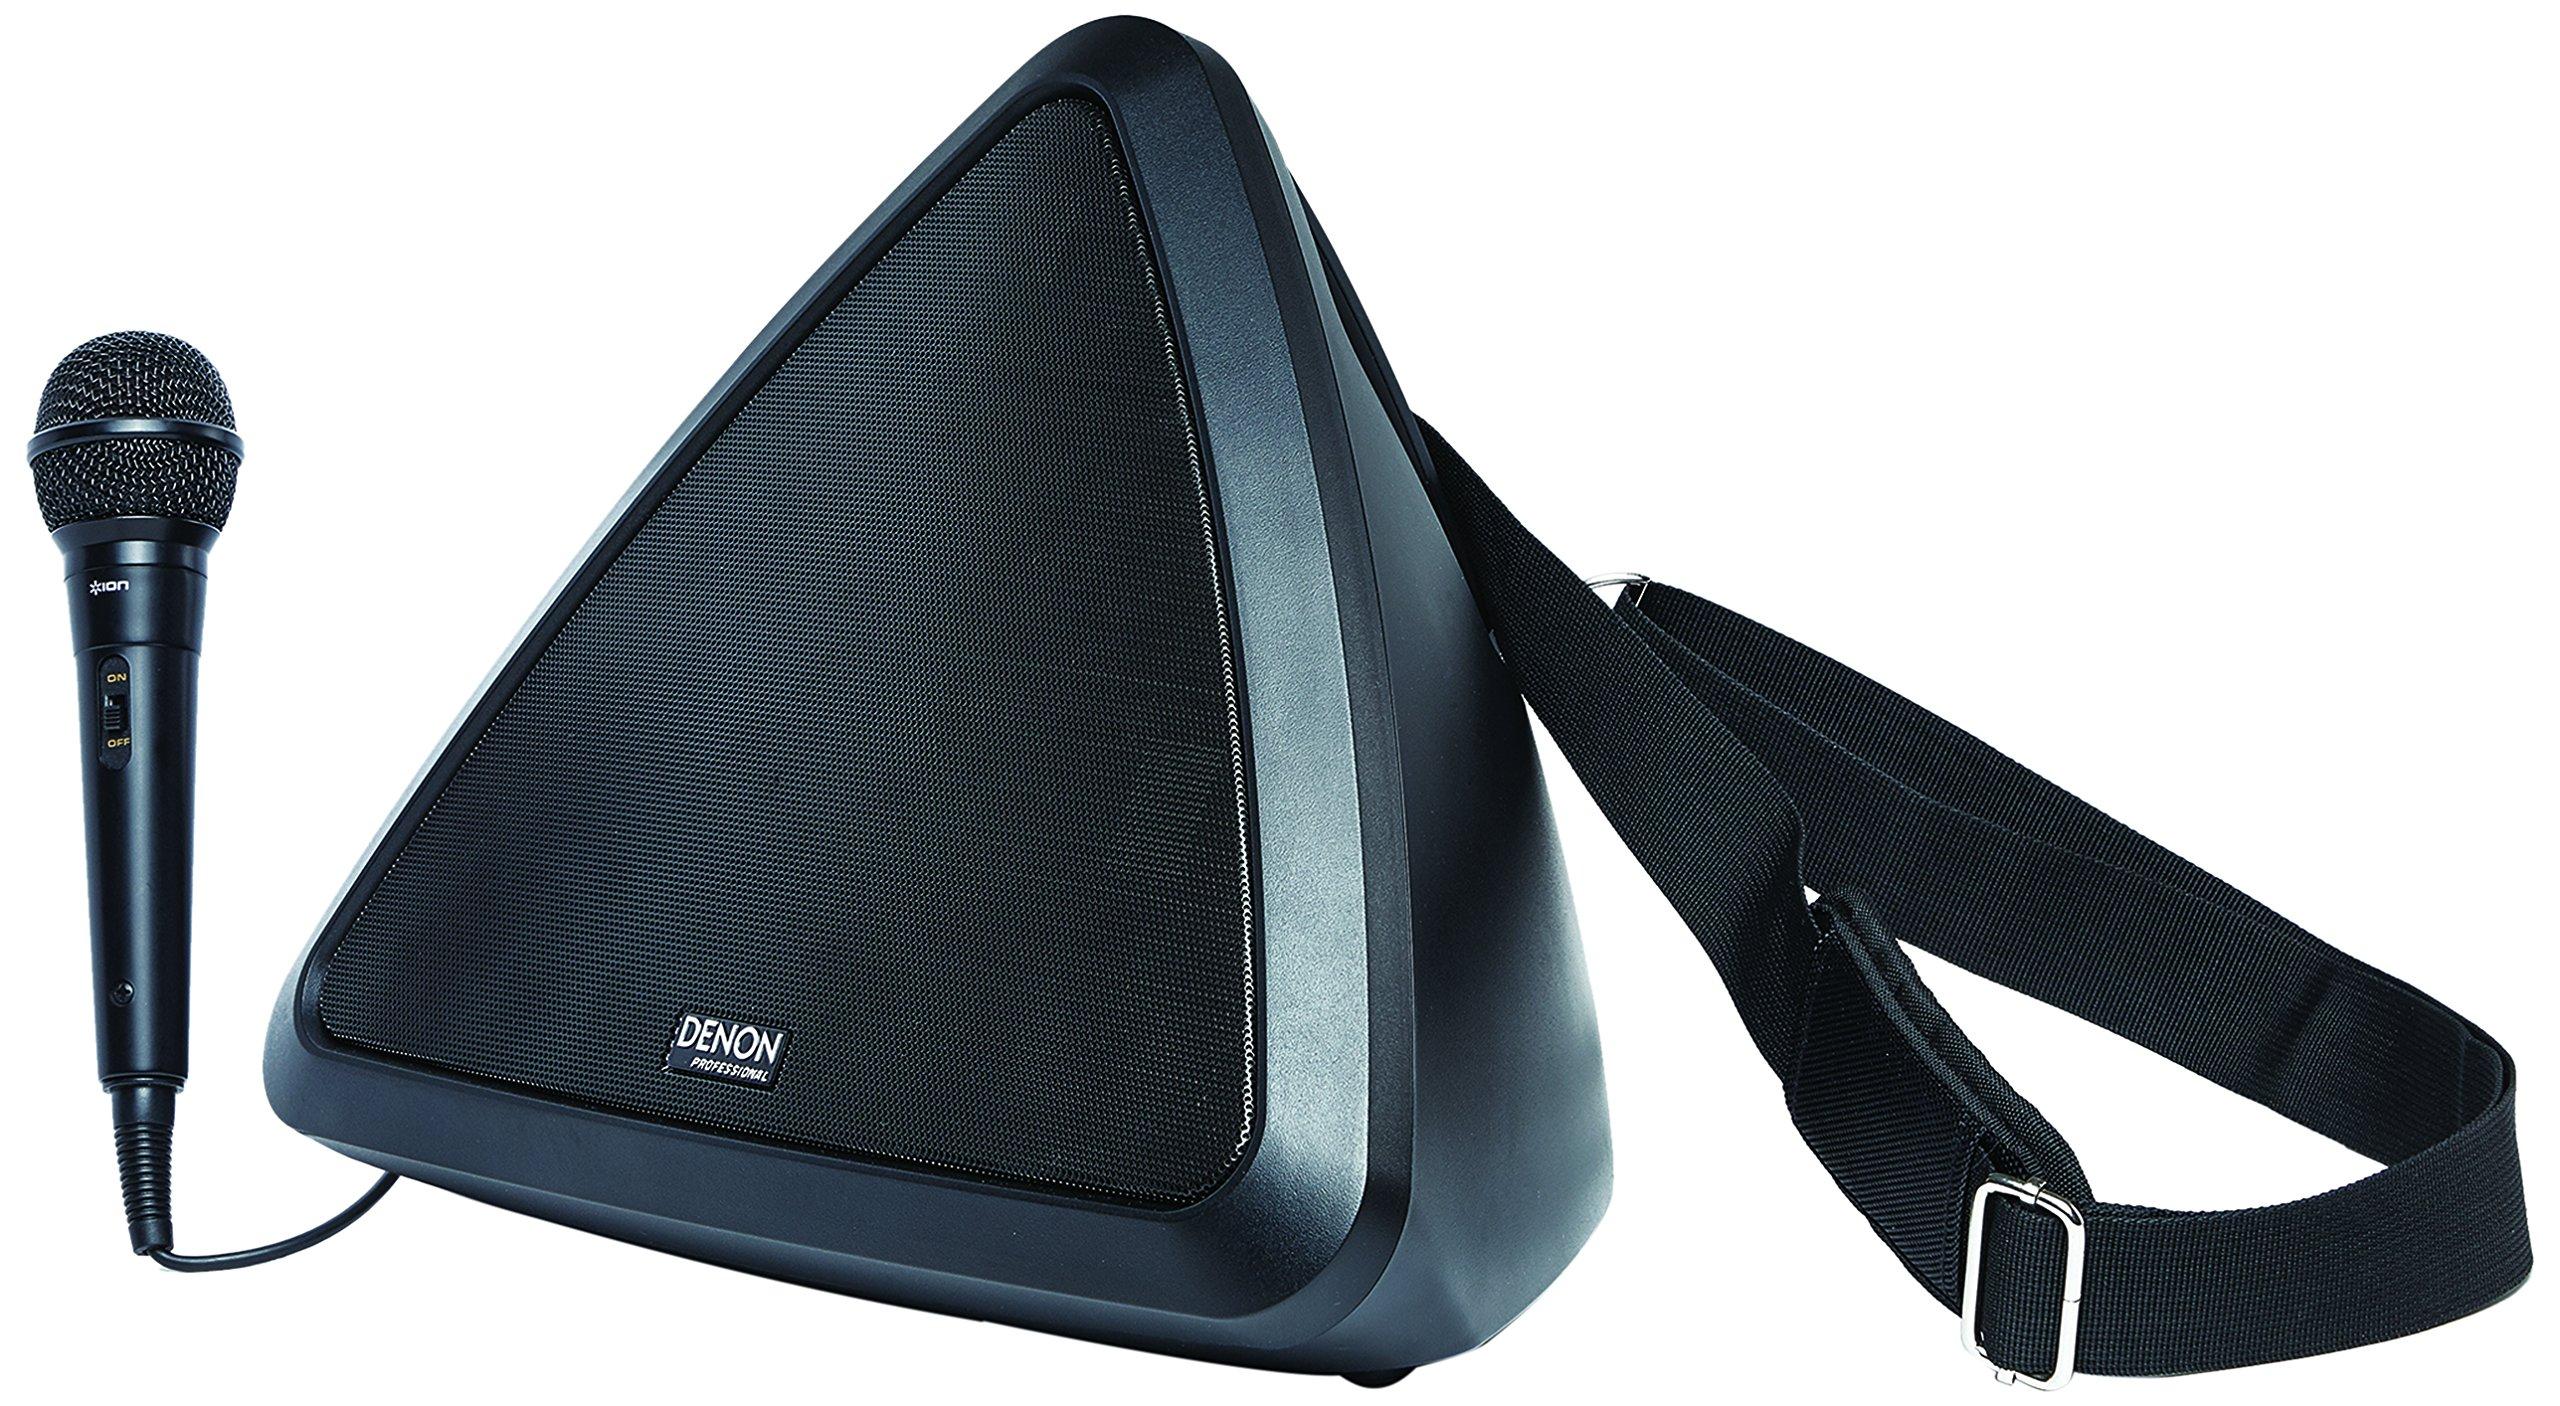 Denon Professional Dispatch | Portable 2-Way Active PA Speaker